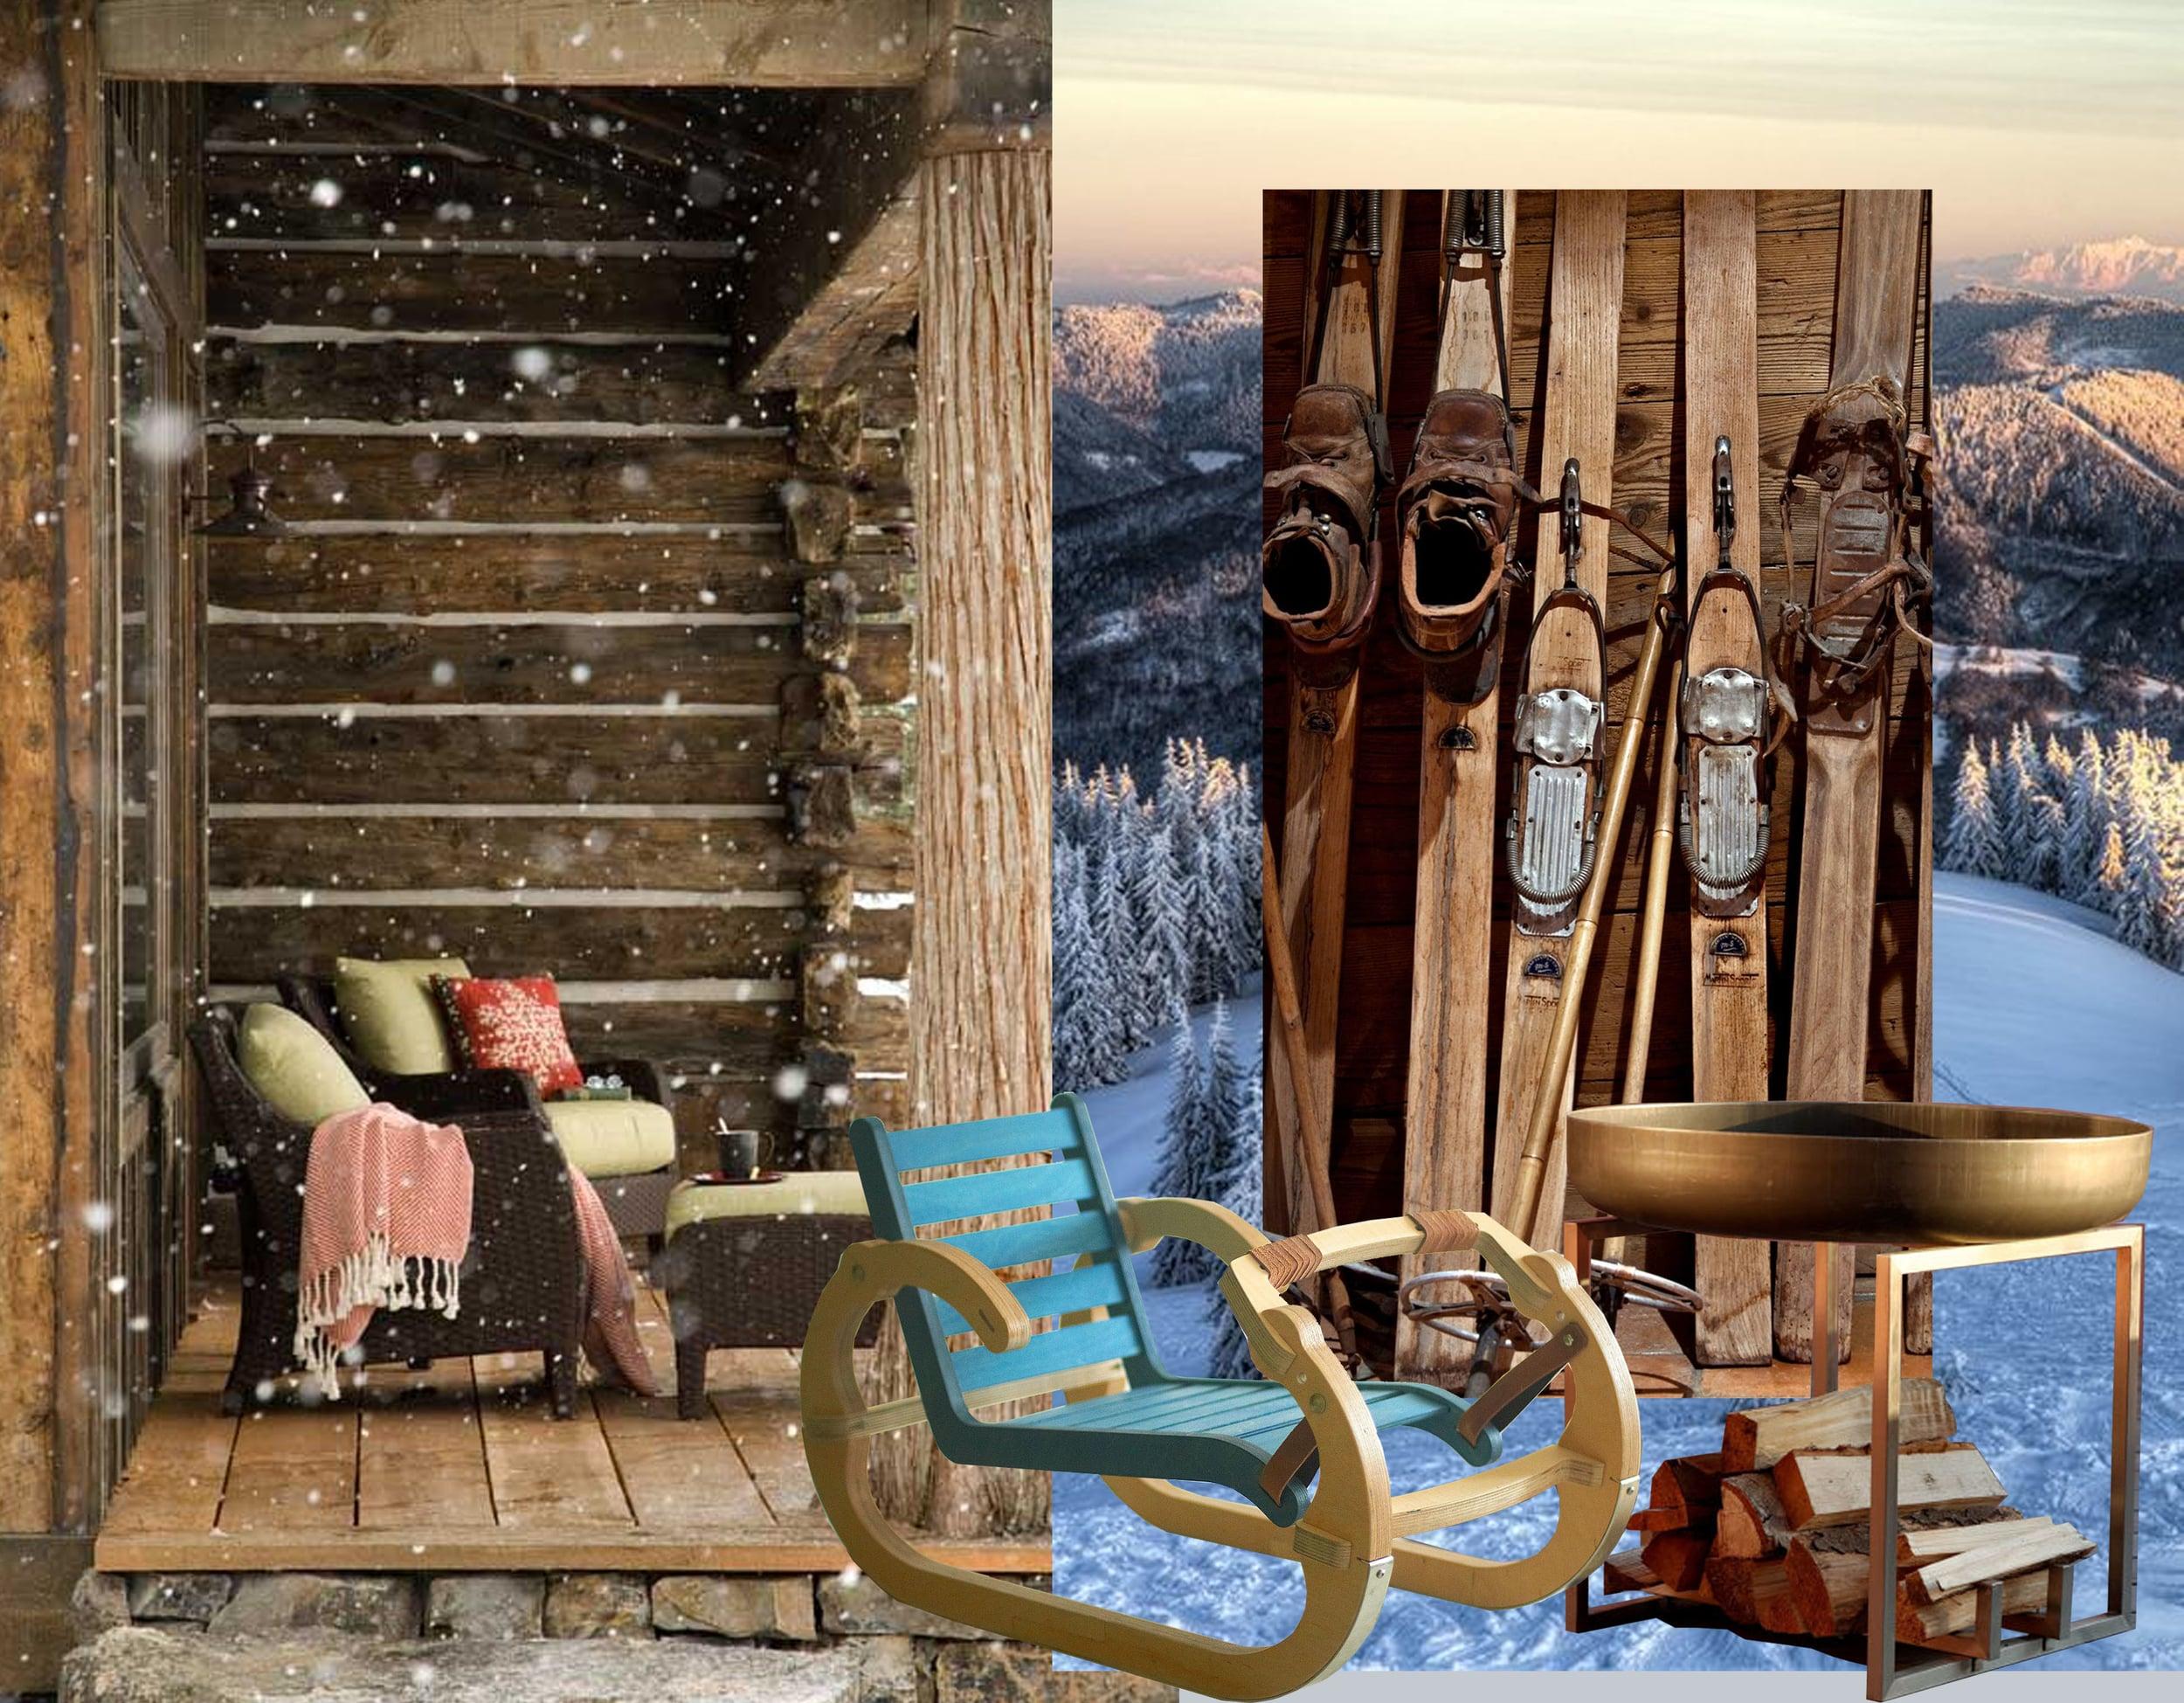 image cabine via  Pinterest  - image skies  Jerome Mondiere  - Playwood Sleigh  Mihai Stamati  - Steel Fire Pit  Arpe Studio